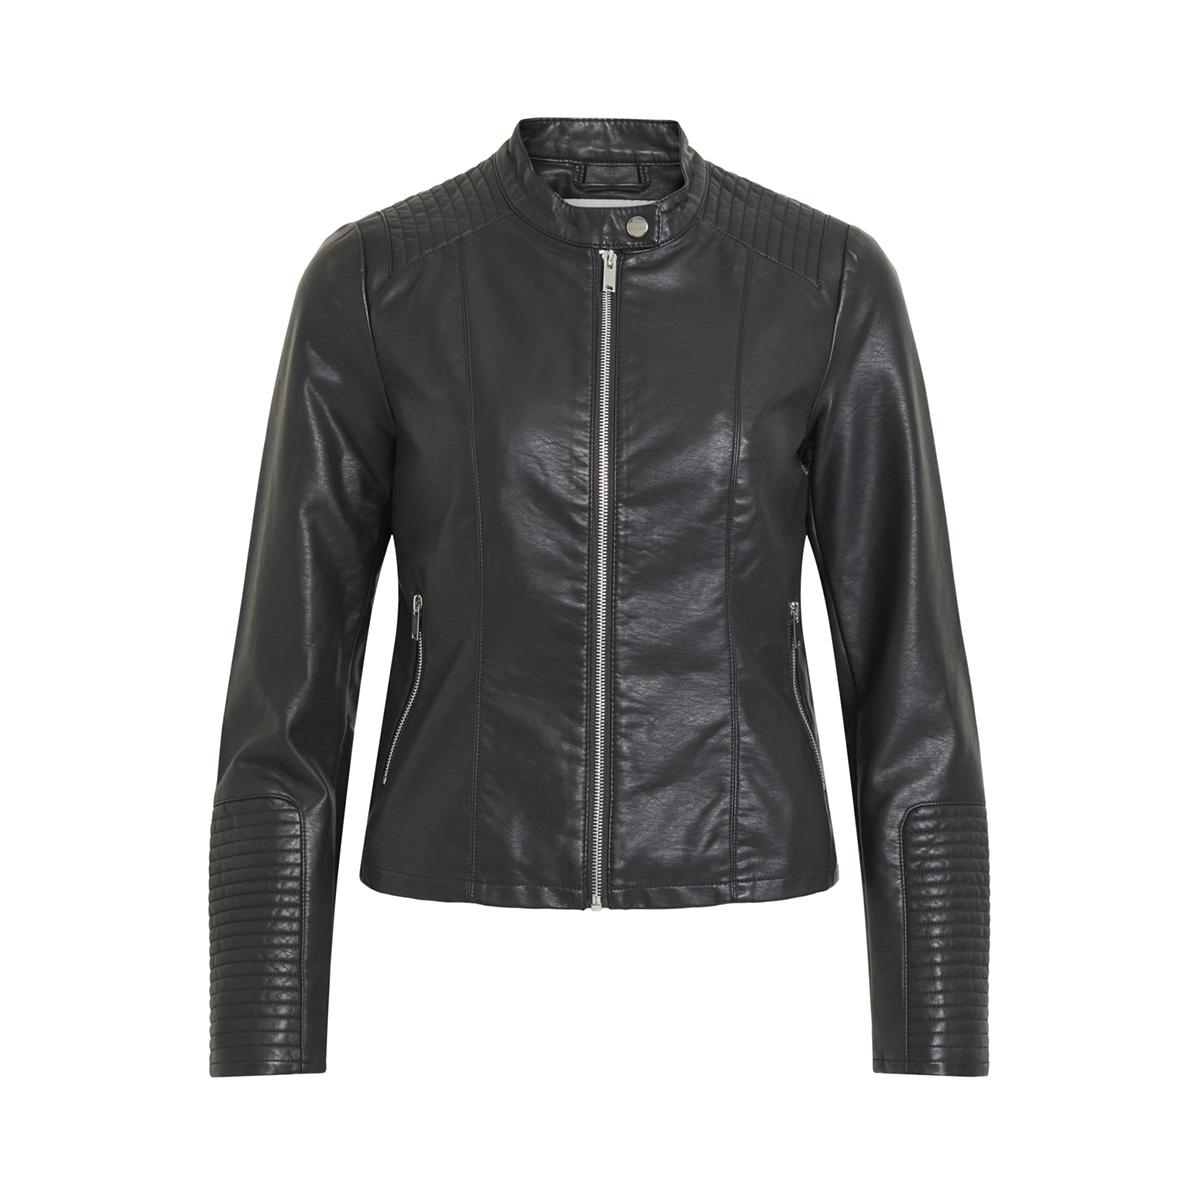 viblue new jacket-noos 14049915 vila jas black